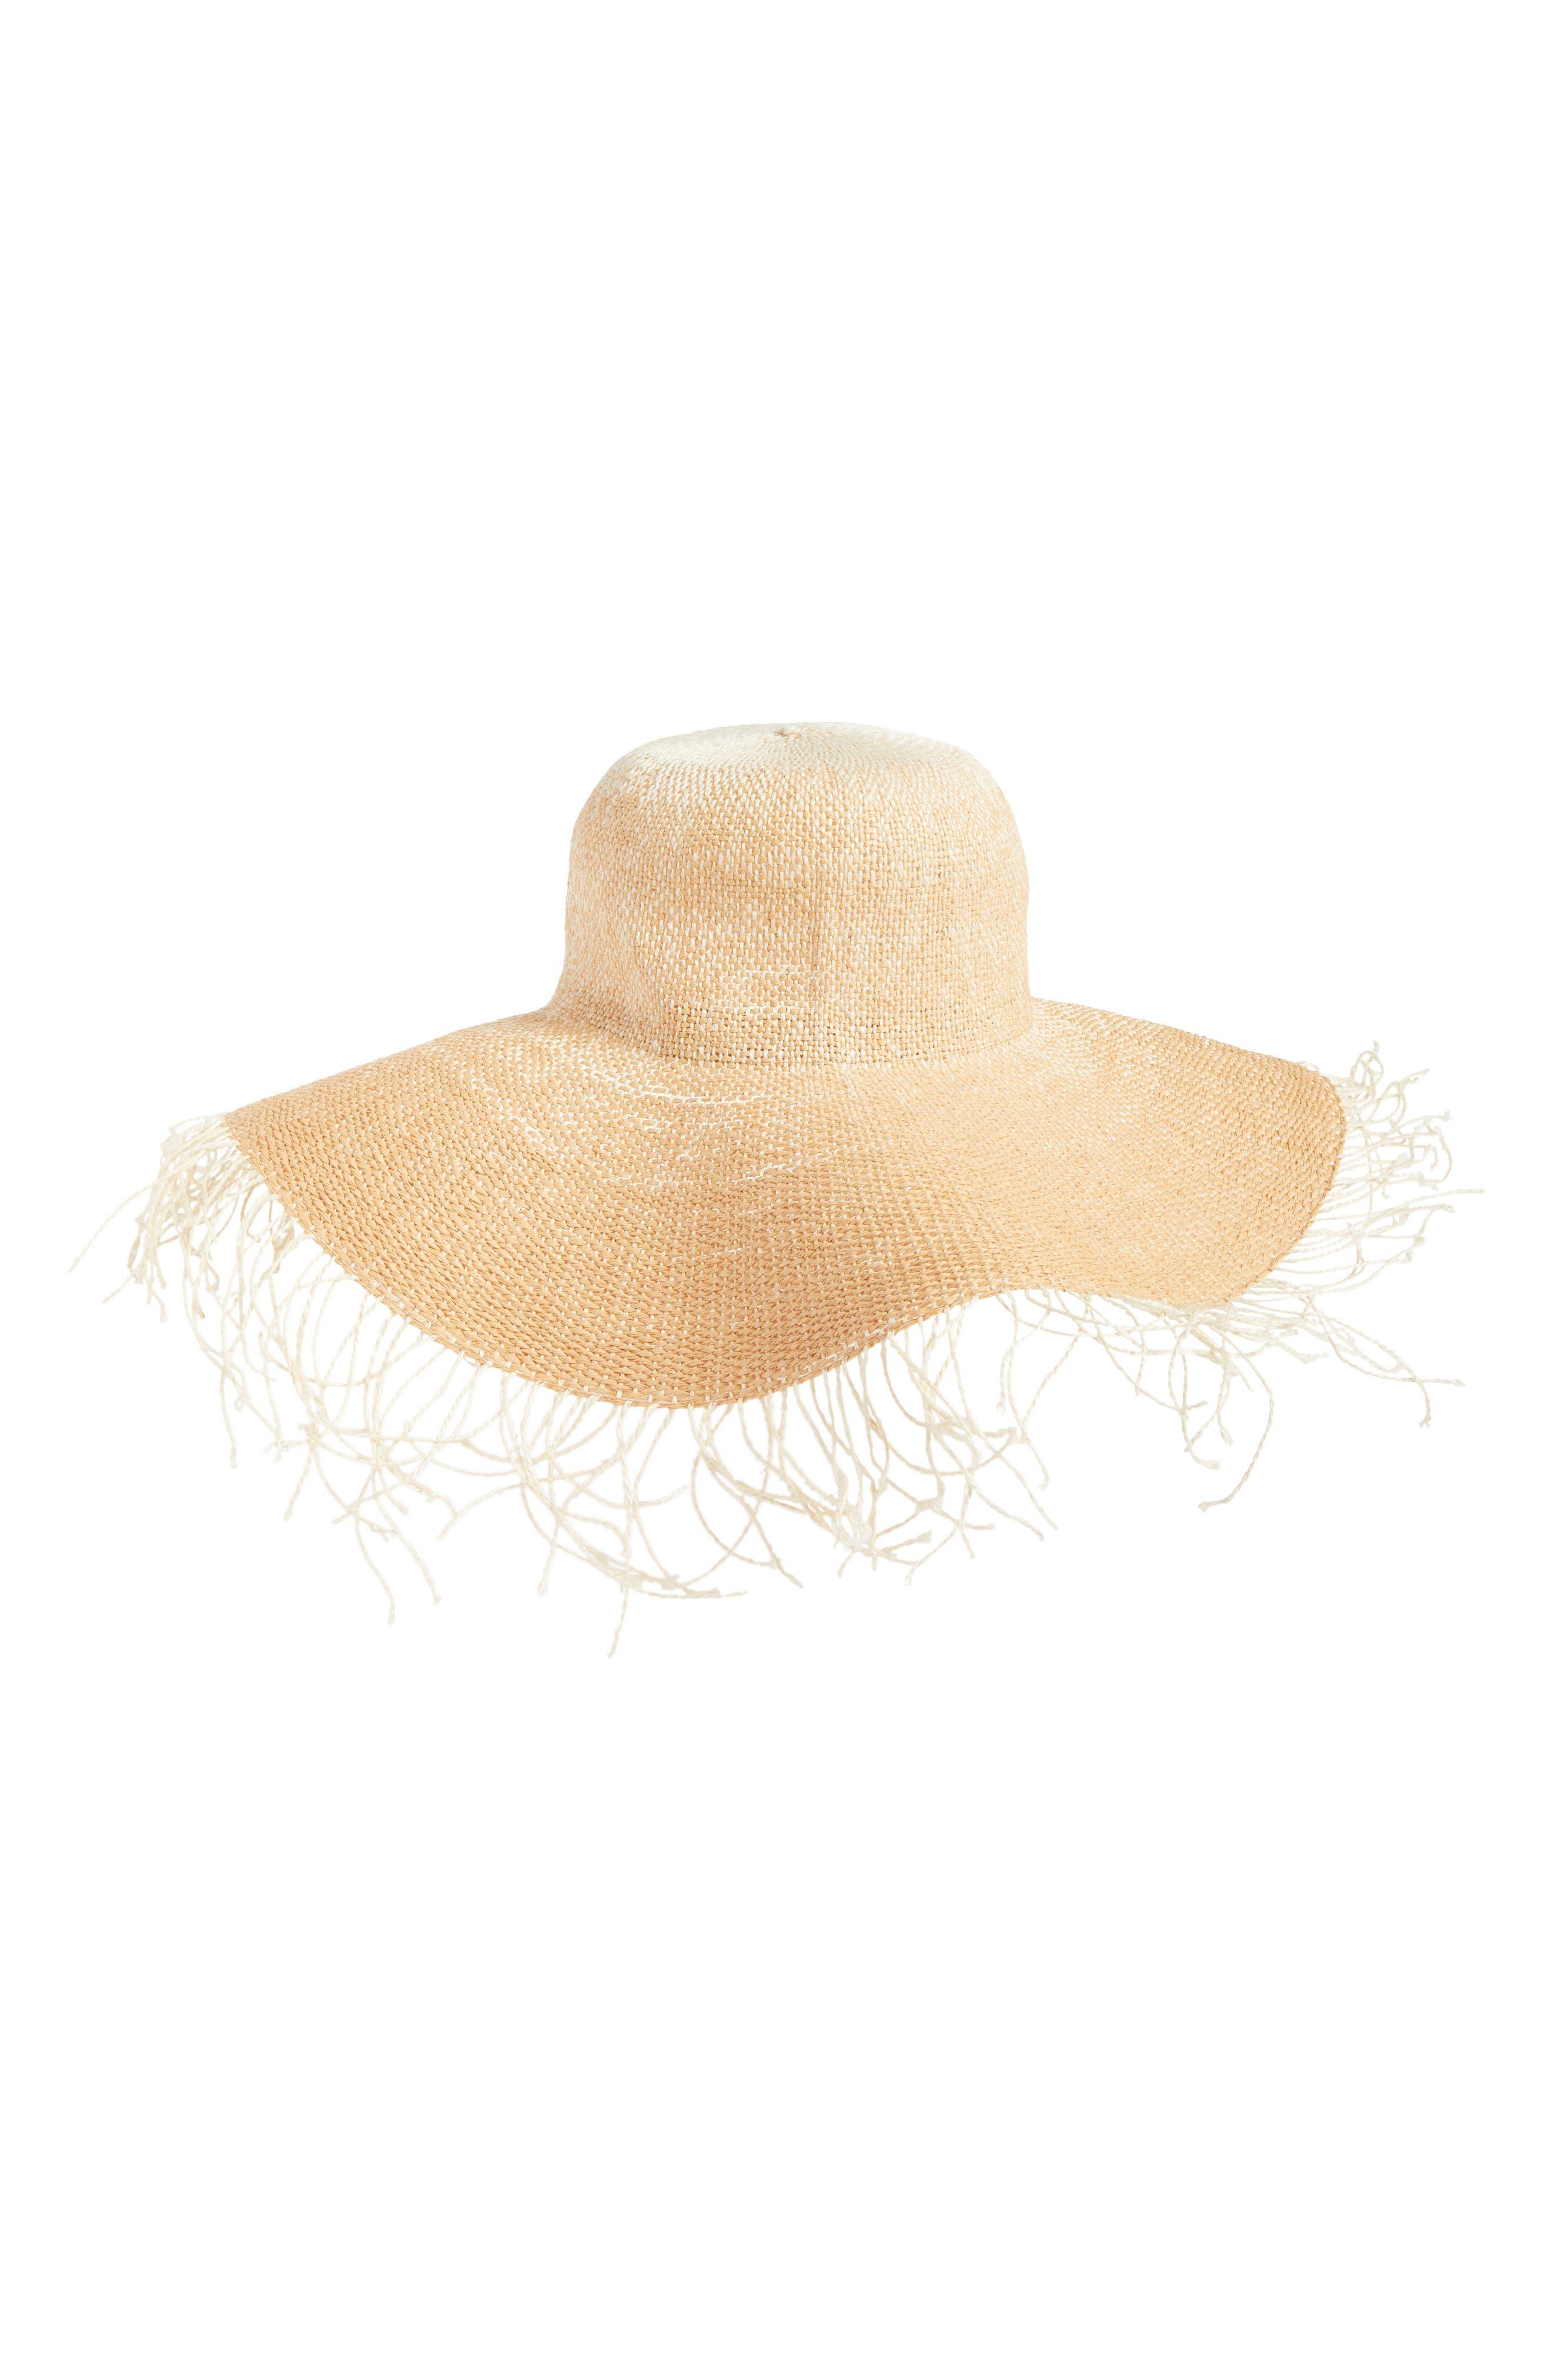 Fringe Ombré Floppy Straw Hat,                             Main thumbnail 1, color,                             Natural/ White